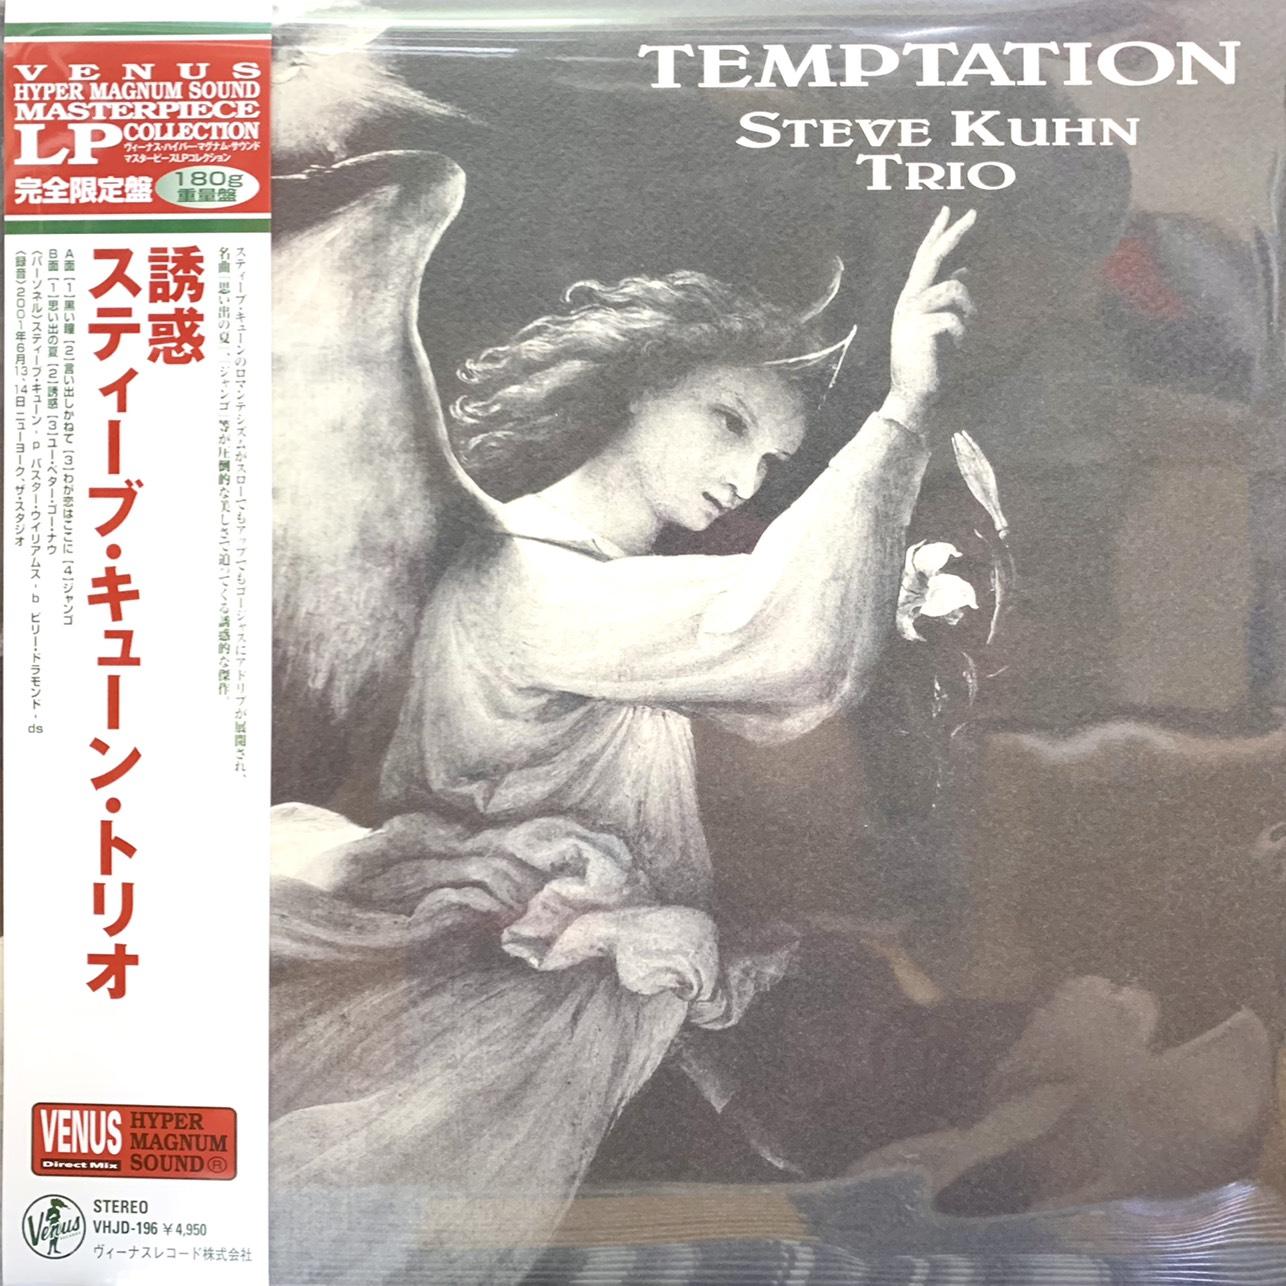 dia-than-vinyl-temptation-steve-kuhn-trio